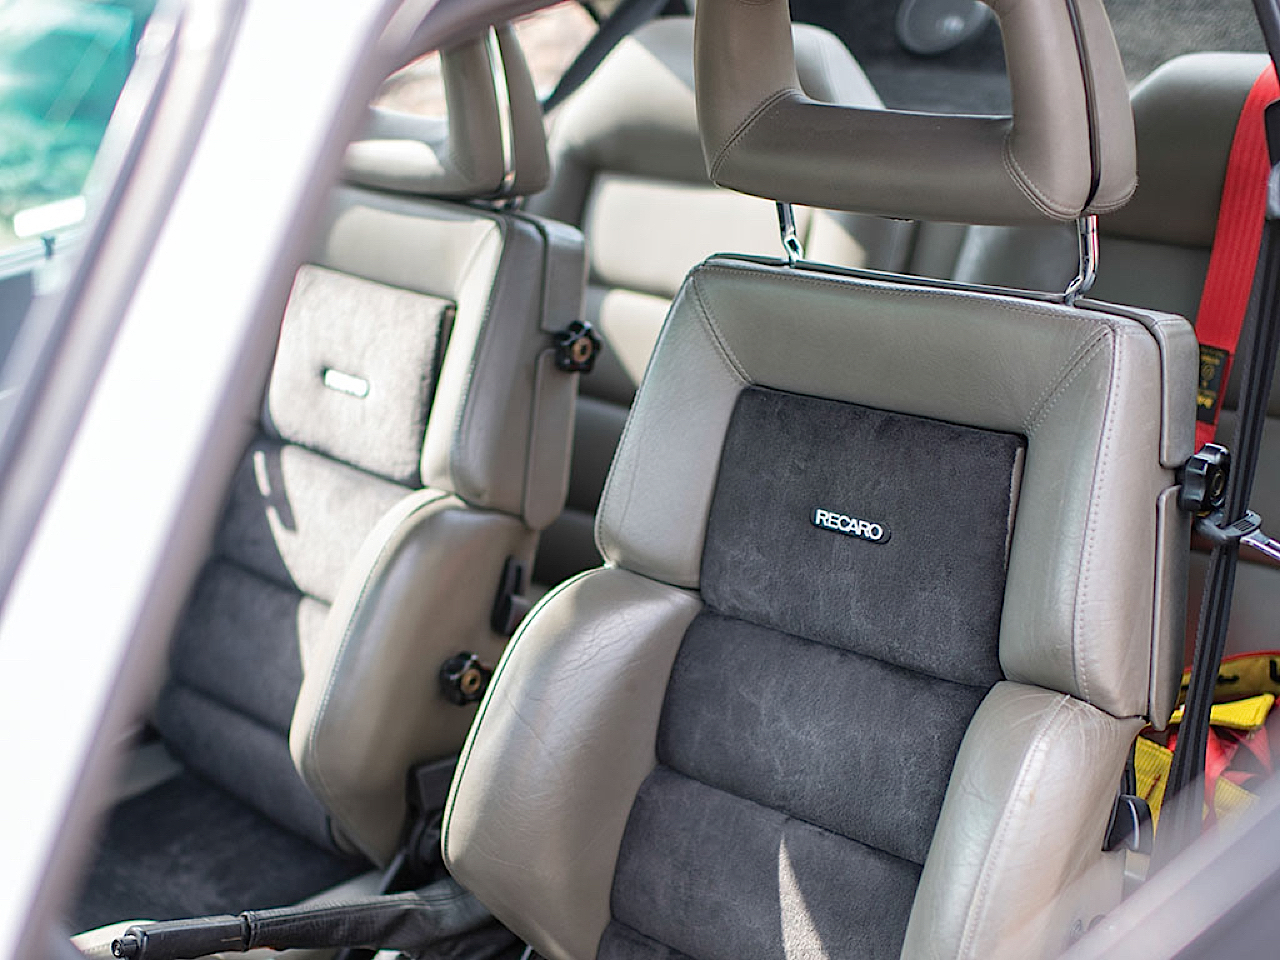 Audi Quattro Sport - Châssis court, turbo et muscu ! 16